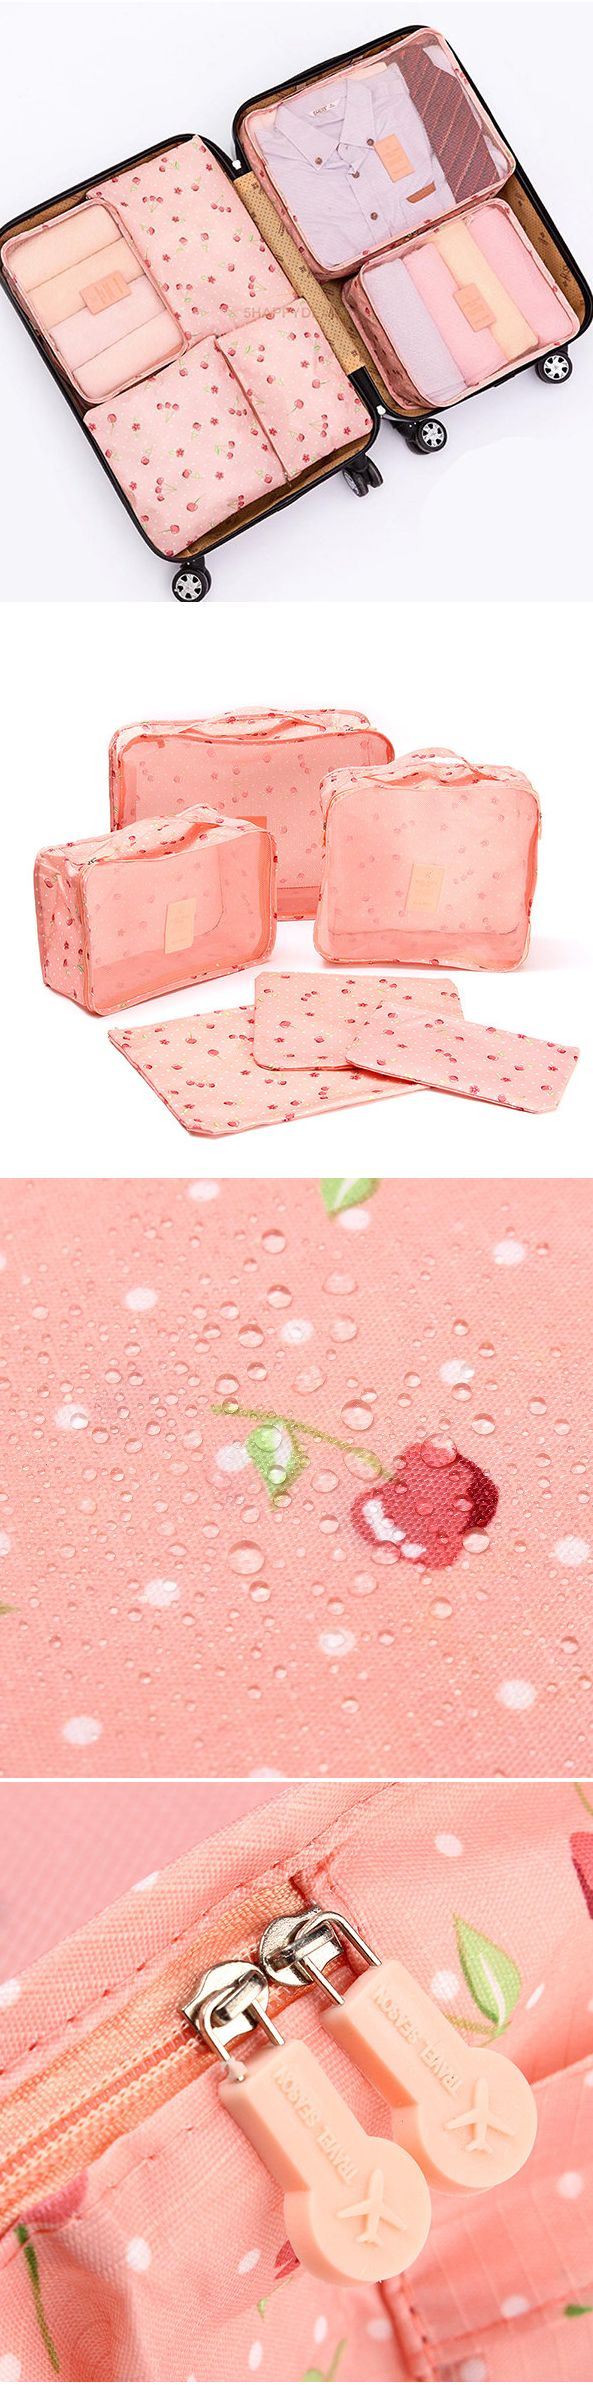 US$8.99  6Pcs Pink Cherry Waterproof Storage Bags Luggage Organizer For Travelers